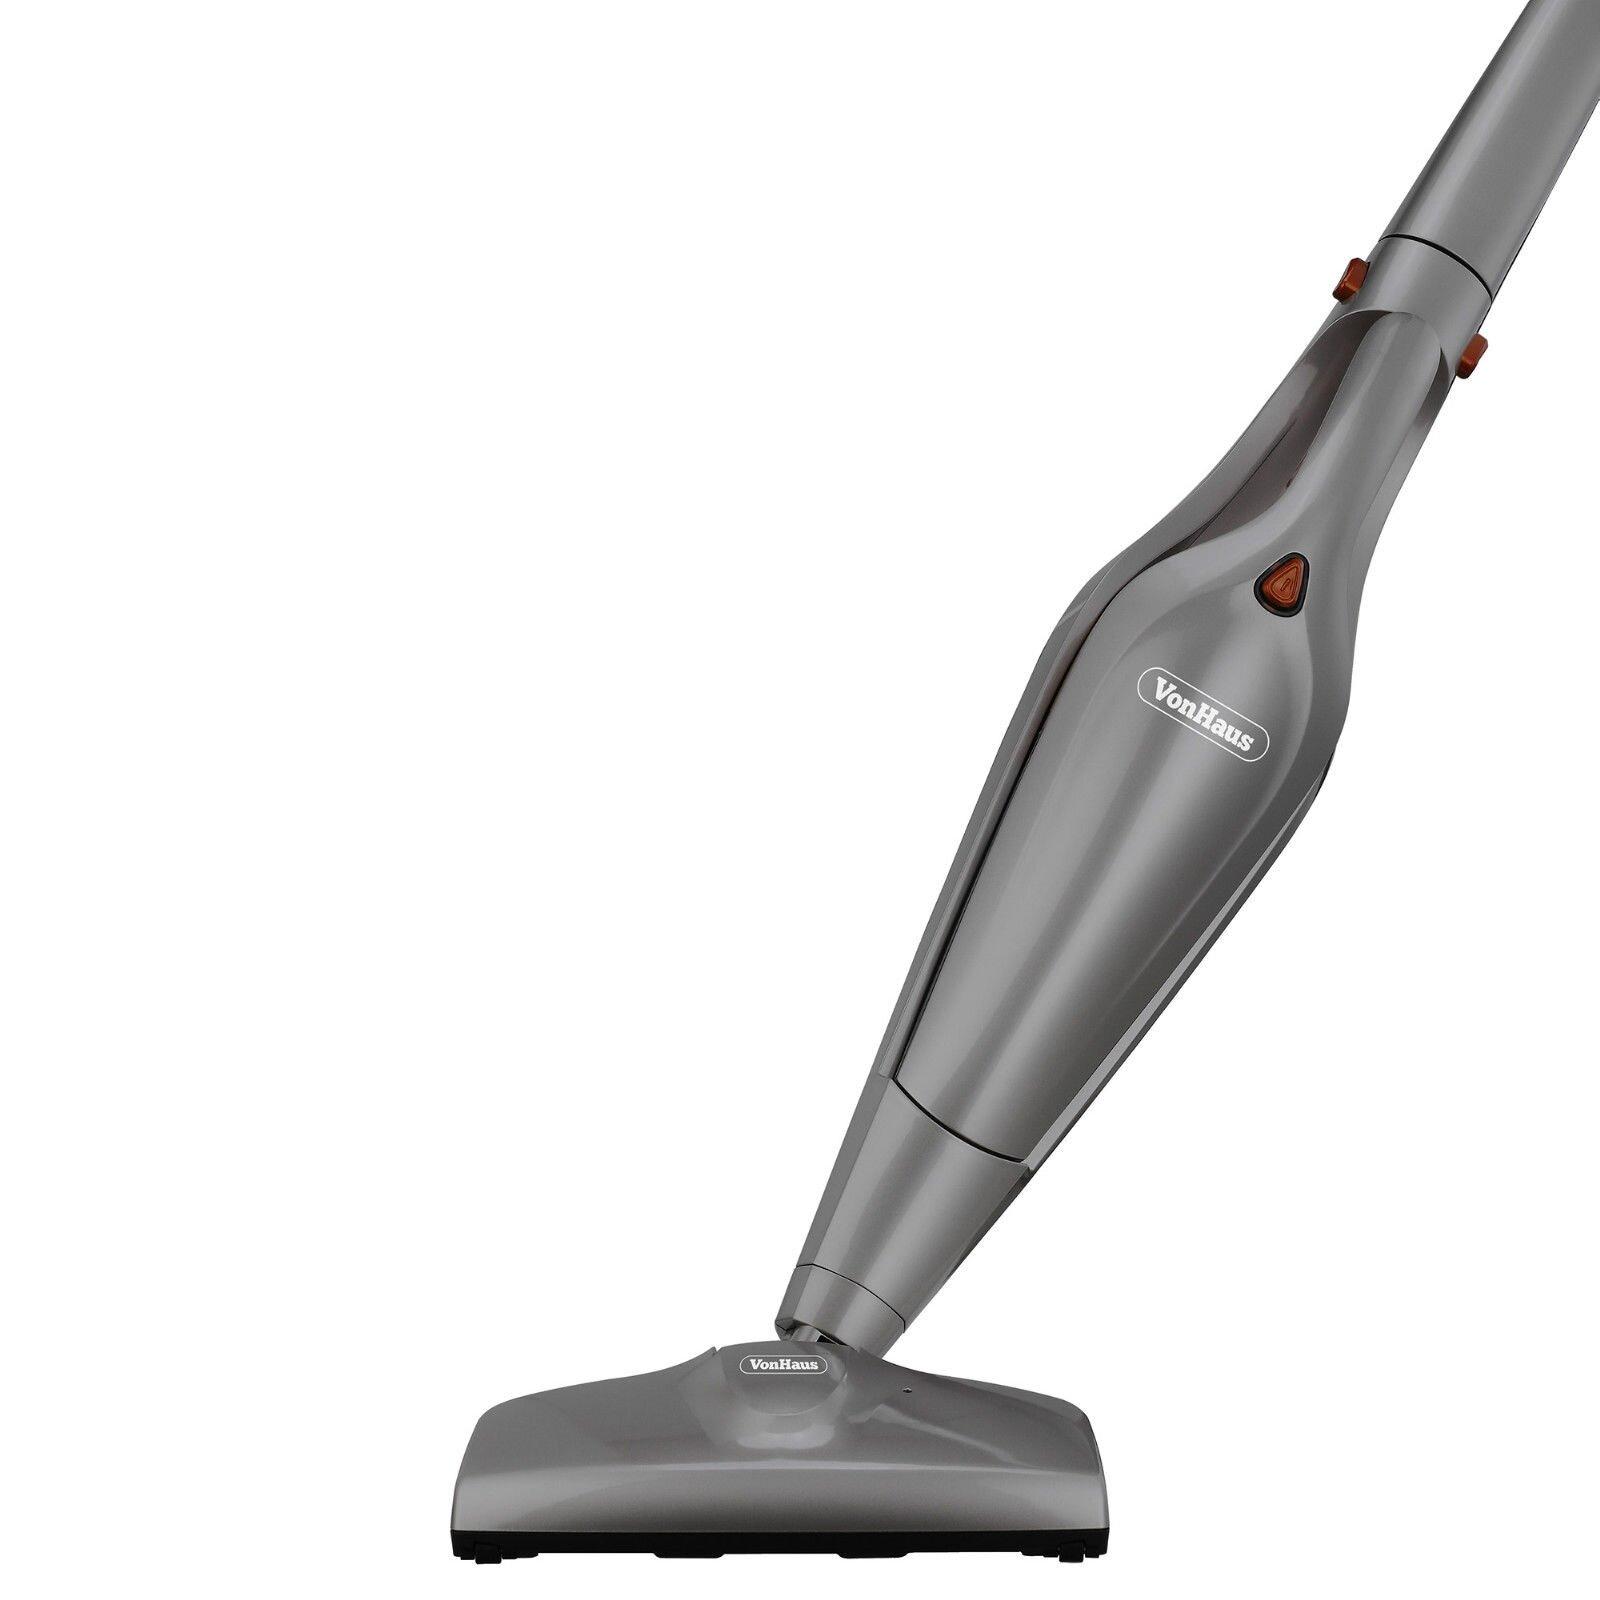 Cordless Vacuum For Hardwood Floors cordless vacuum anker eufy homevac duo 2 In 1 Cordless Vacuum Cleaner